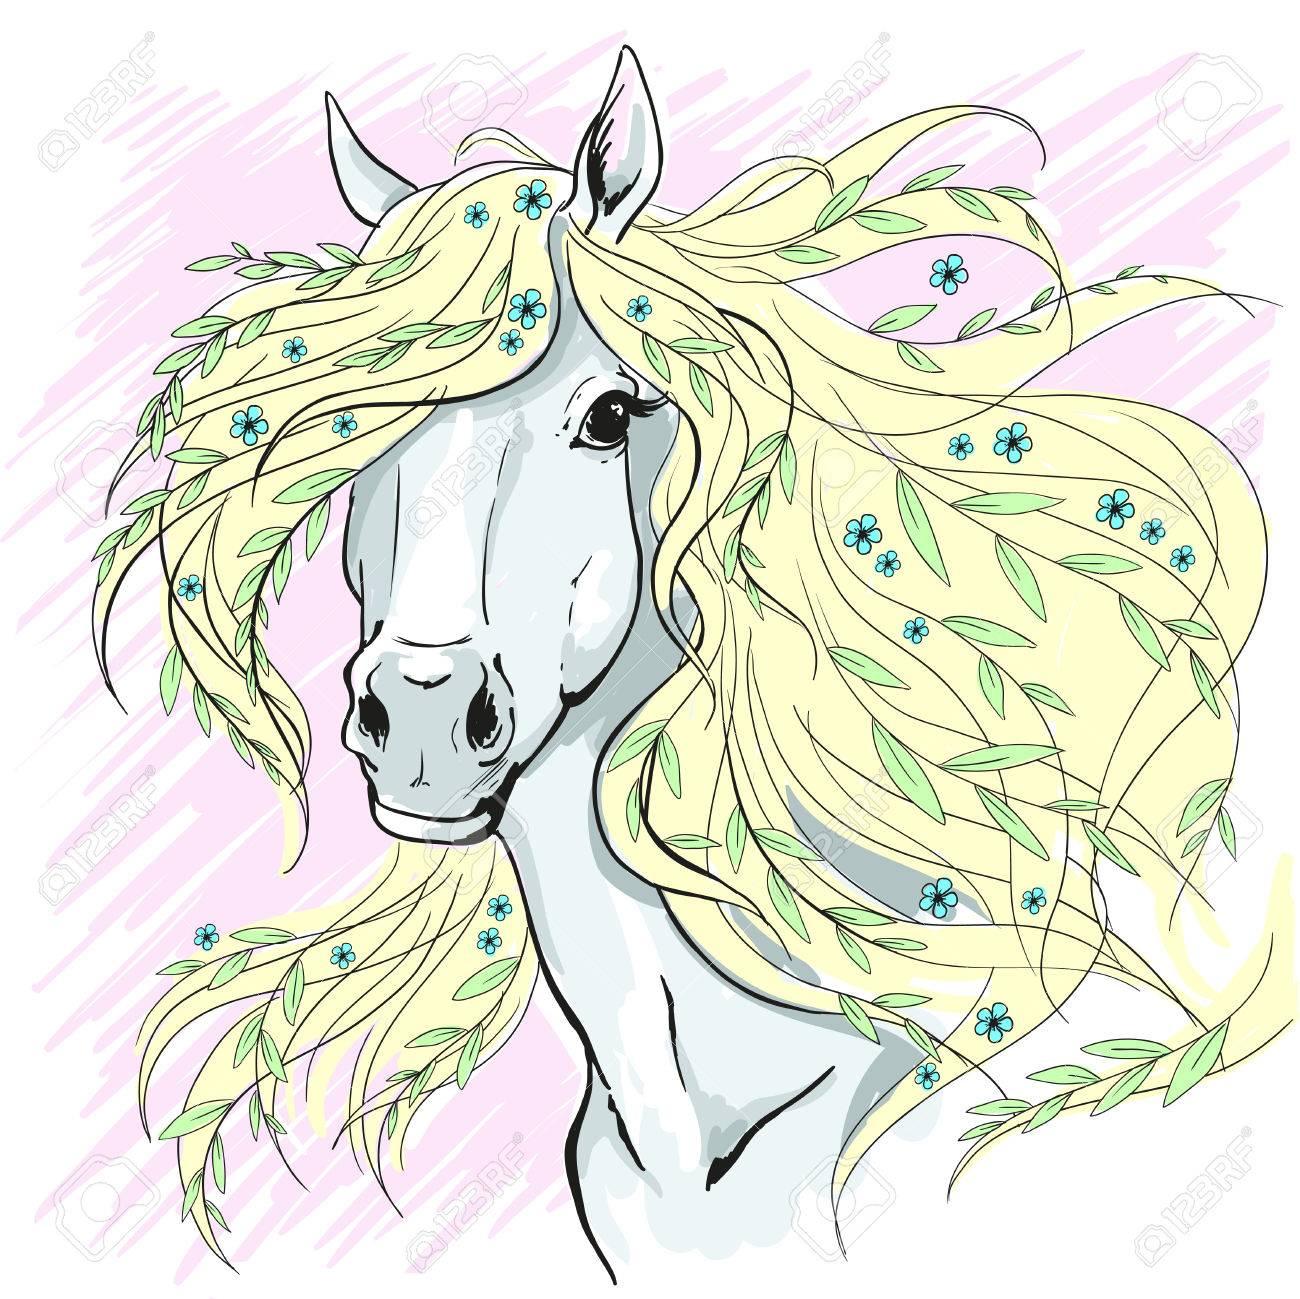 1300x1299 Horse Portrait. Horse Head With Flowers. Color Illustration